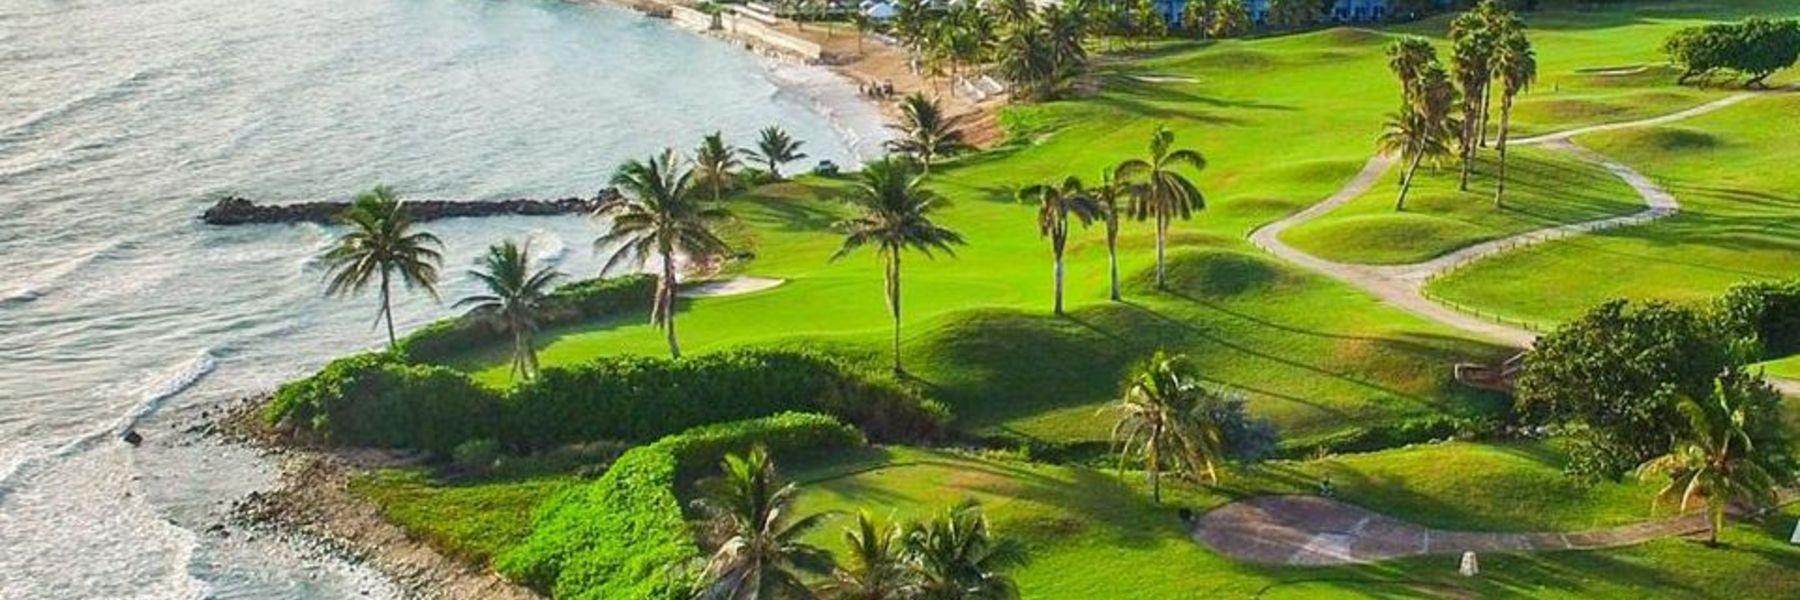 Golf Vacation Package - Cinnamon Hill Golf Club